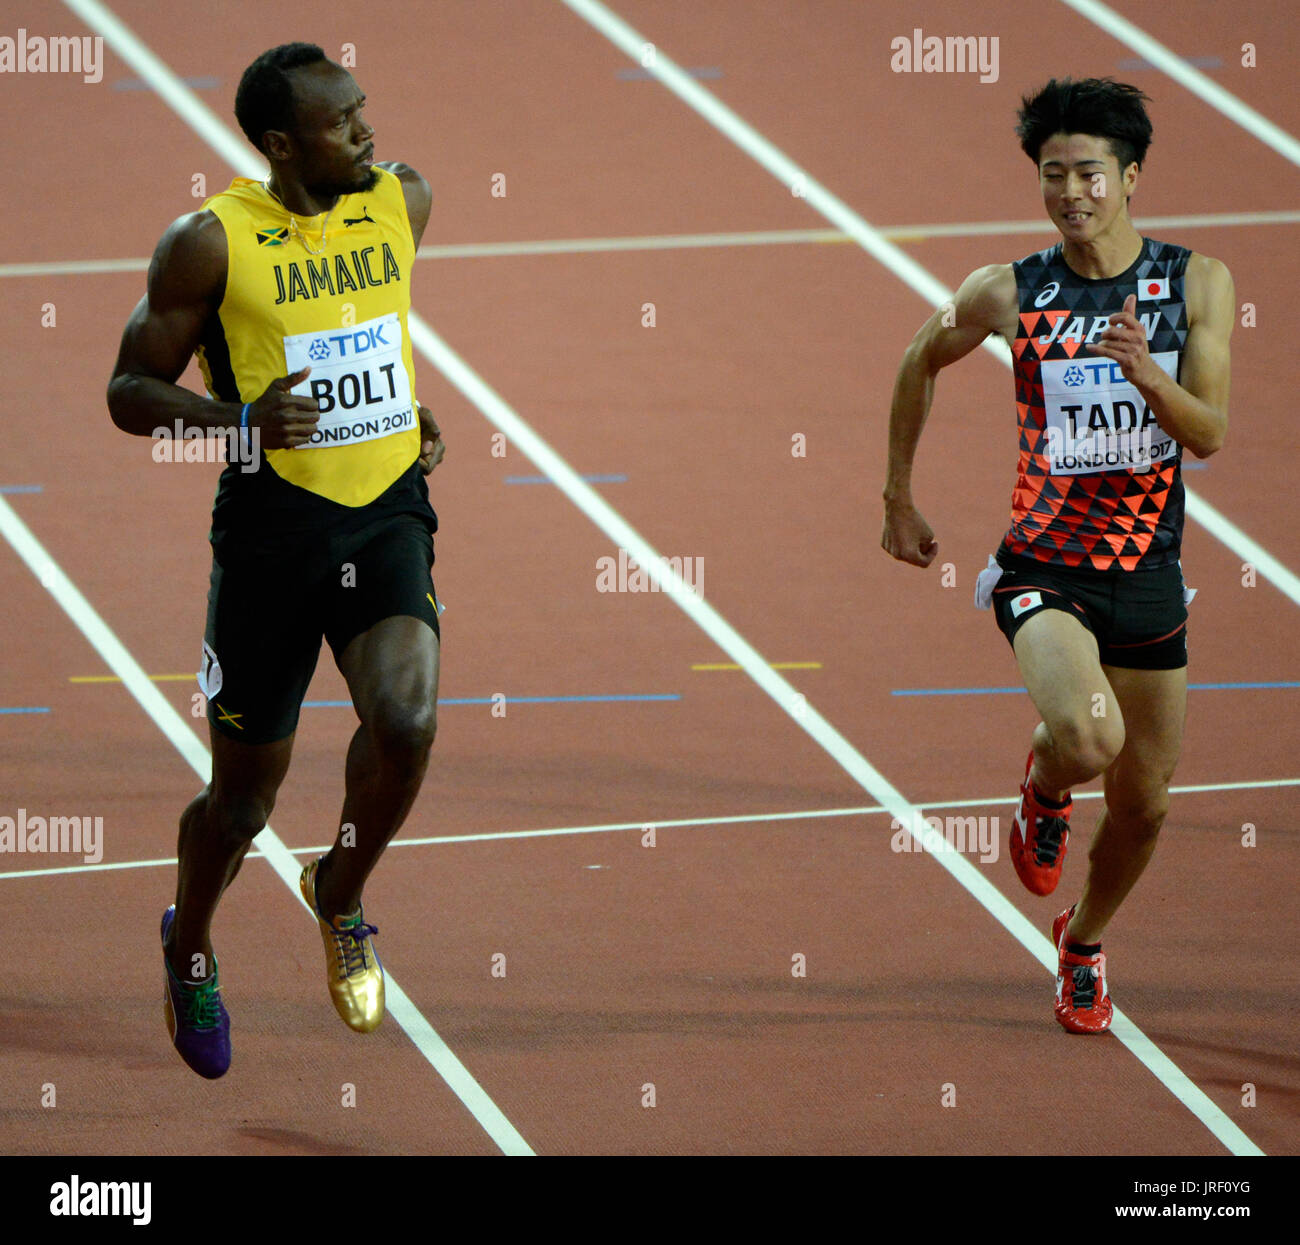 Usain Bolt - IAAF World Championships London 2017 Stockbild